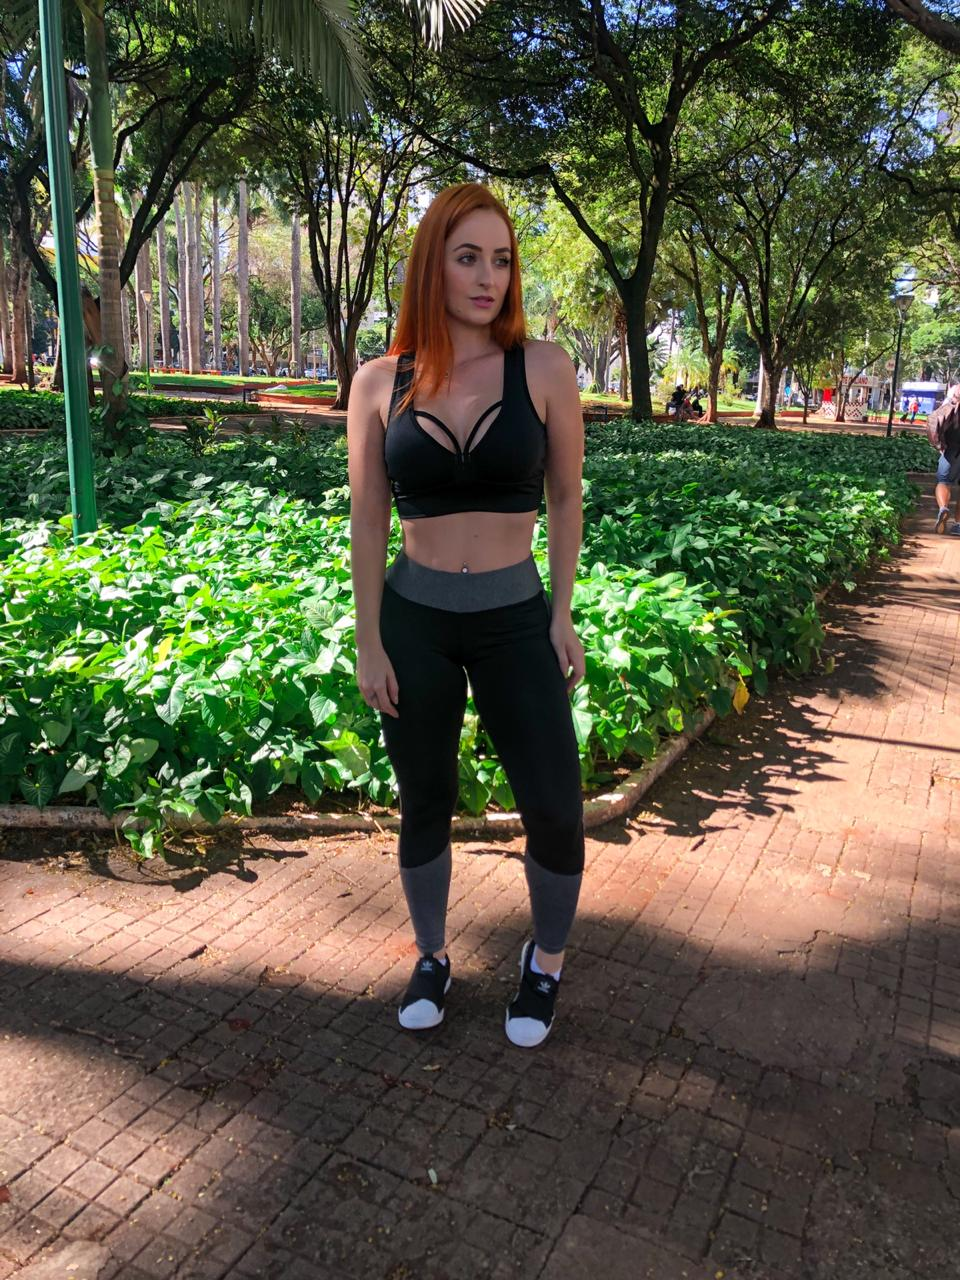 Top Fitness Feminino - Bojo Removível